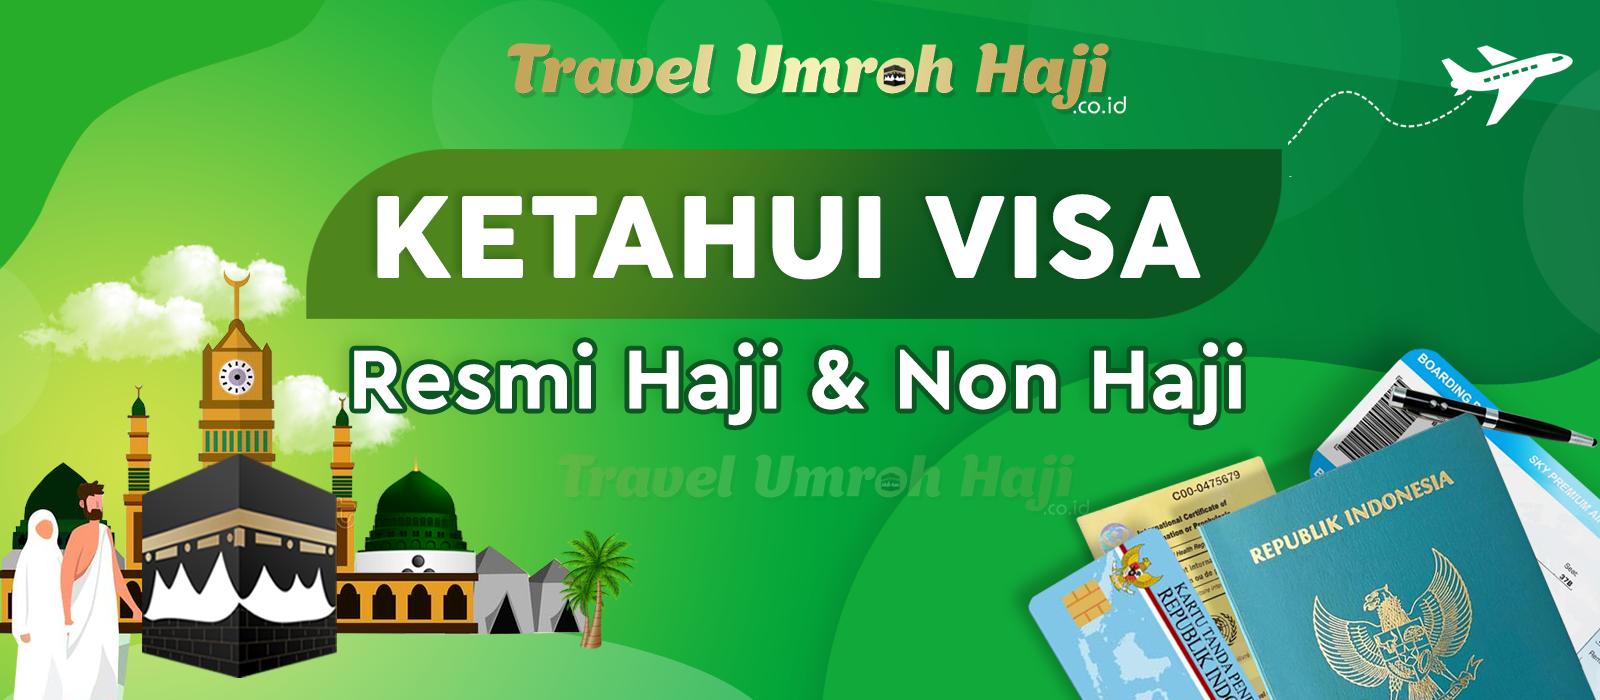 Ketahui Visa Untuk Haji : Reguler, Onh Plus, Visa Furoda / Mujamalah, dan Ketahui Visa Bukan Untuk Haji : Ziarah Syakhsiyah / Tijariyah, Amil